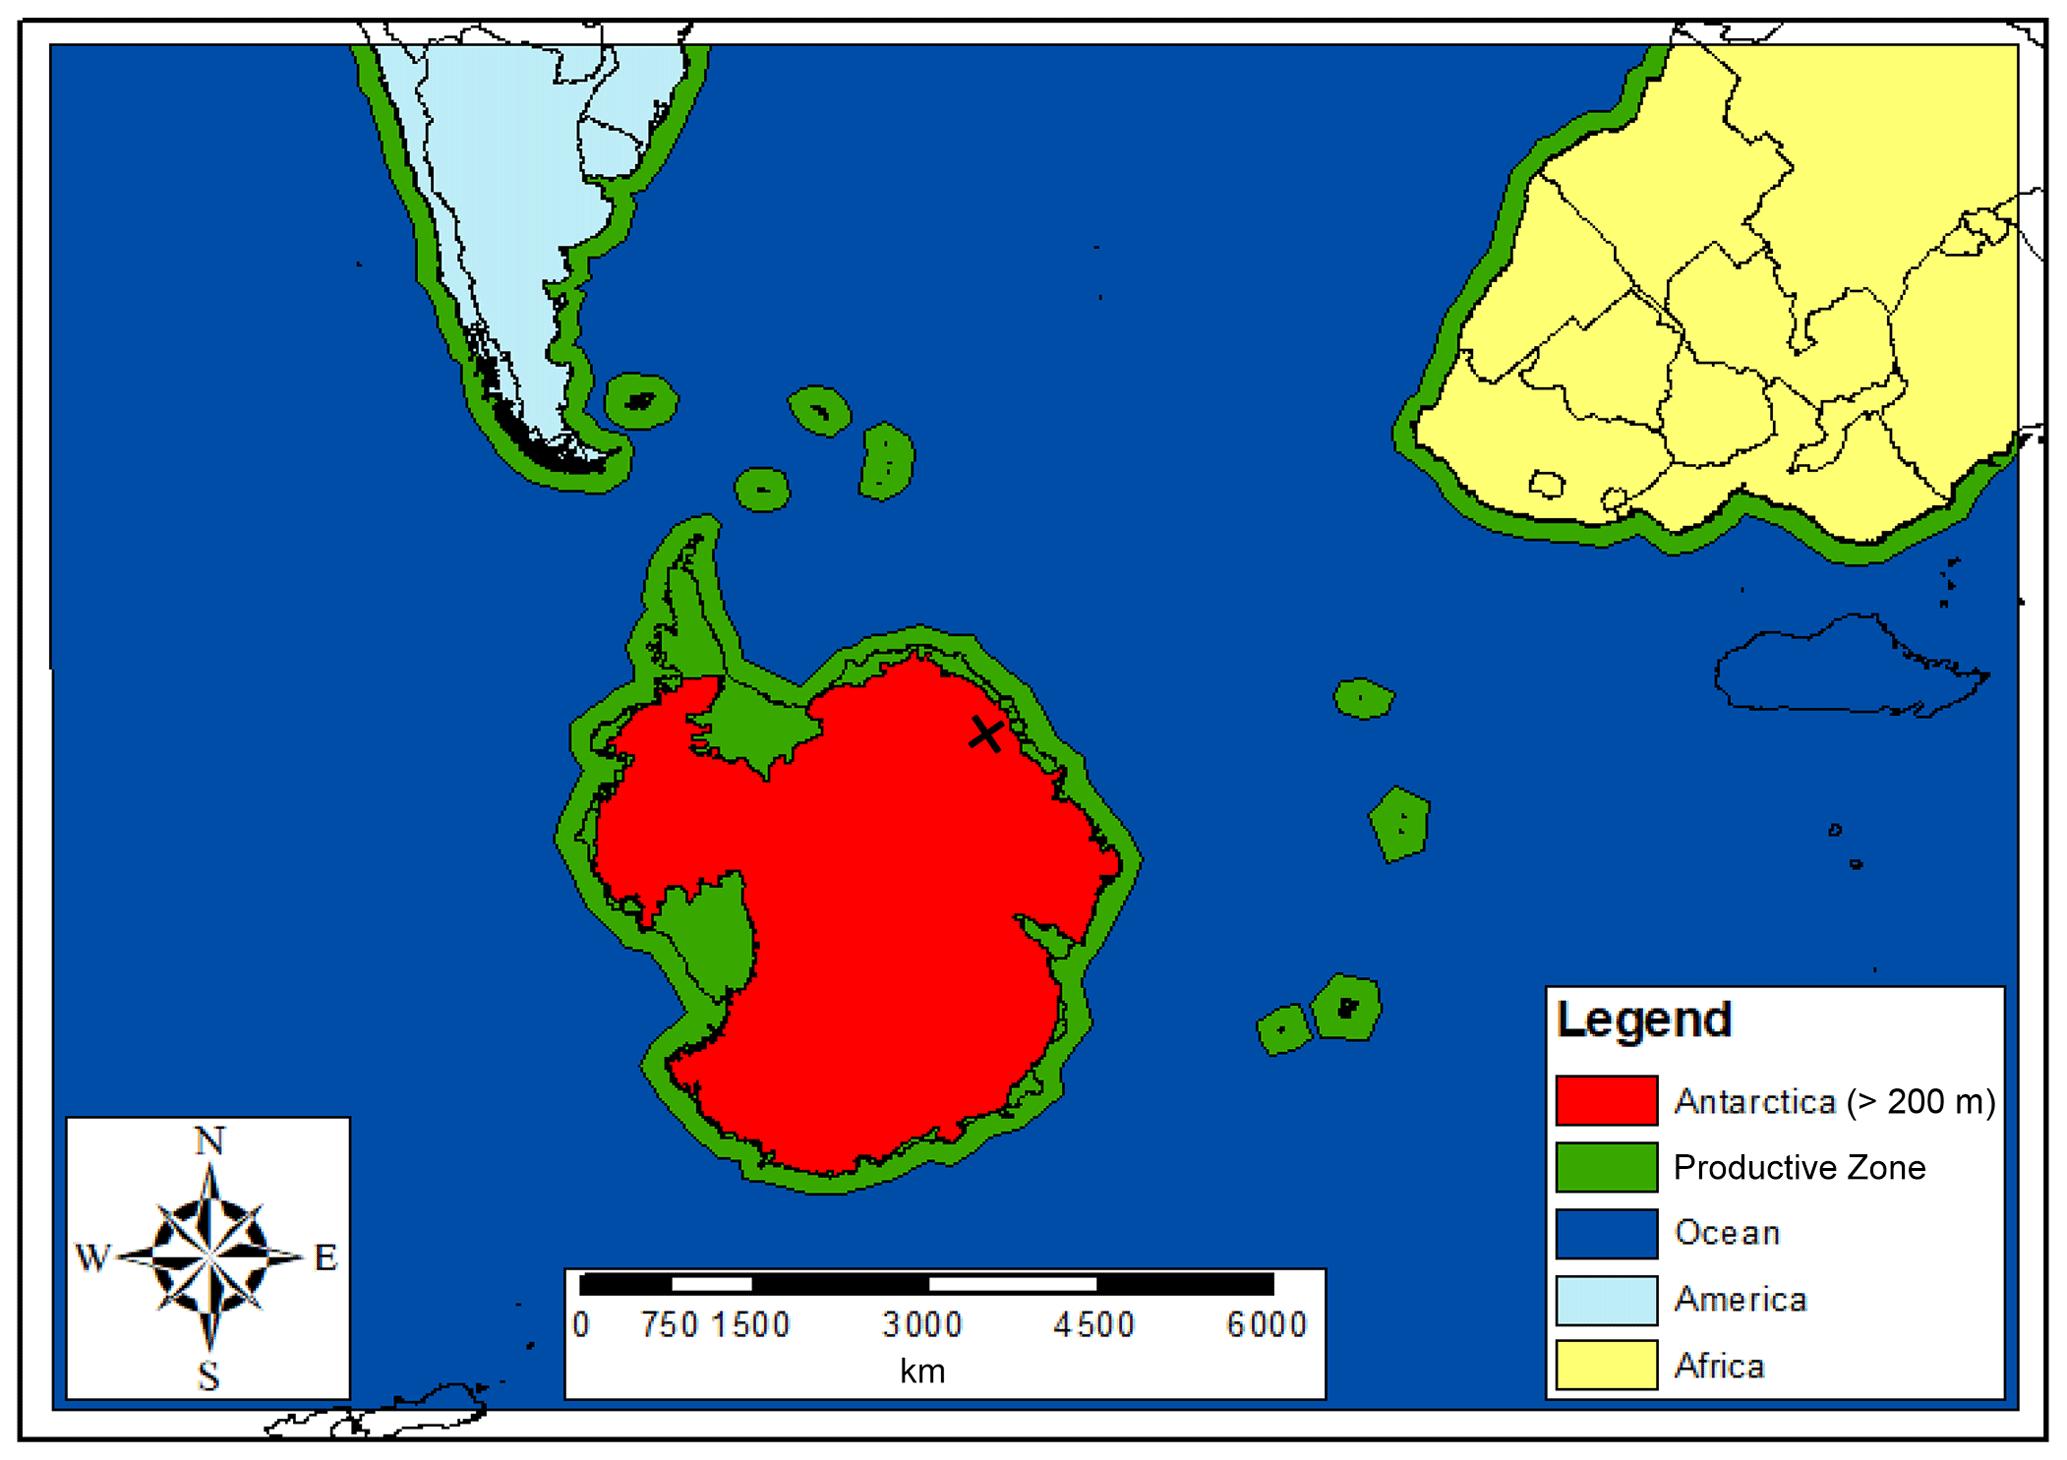 ACP - CCN measurements at the Princess Elisabeth Antarctica